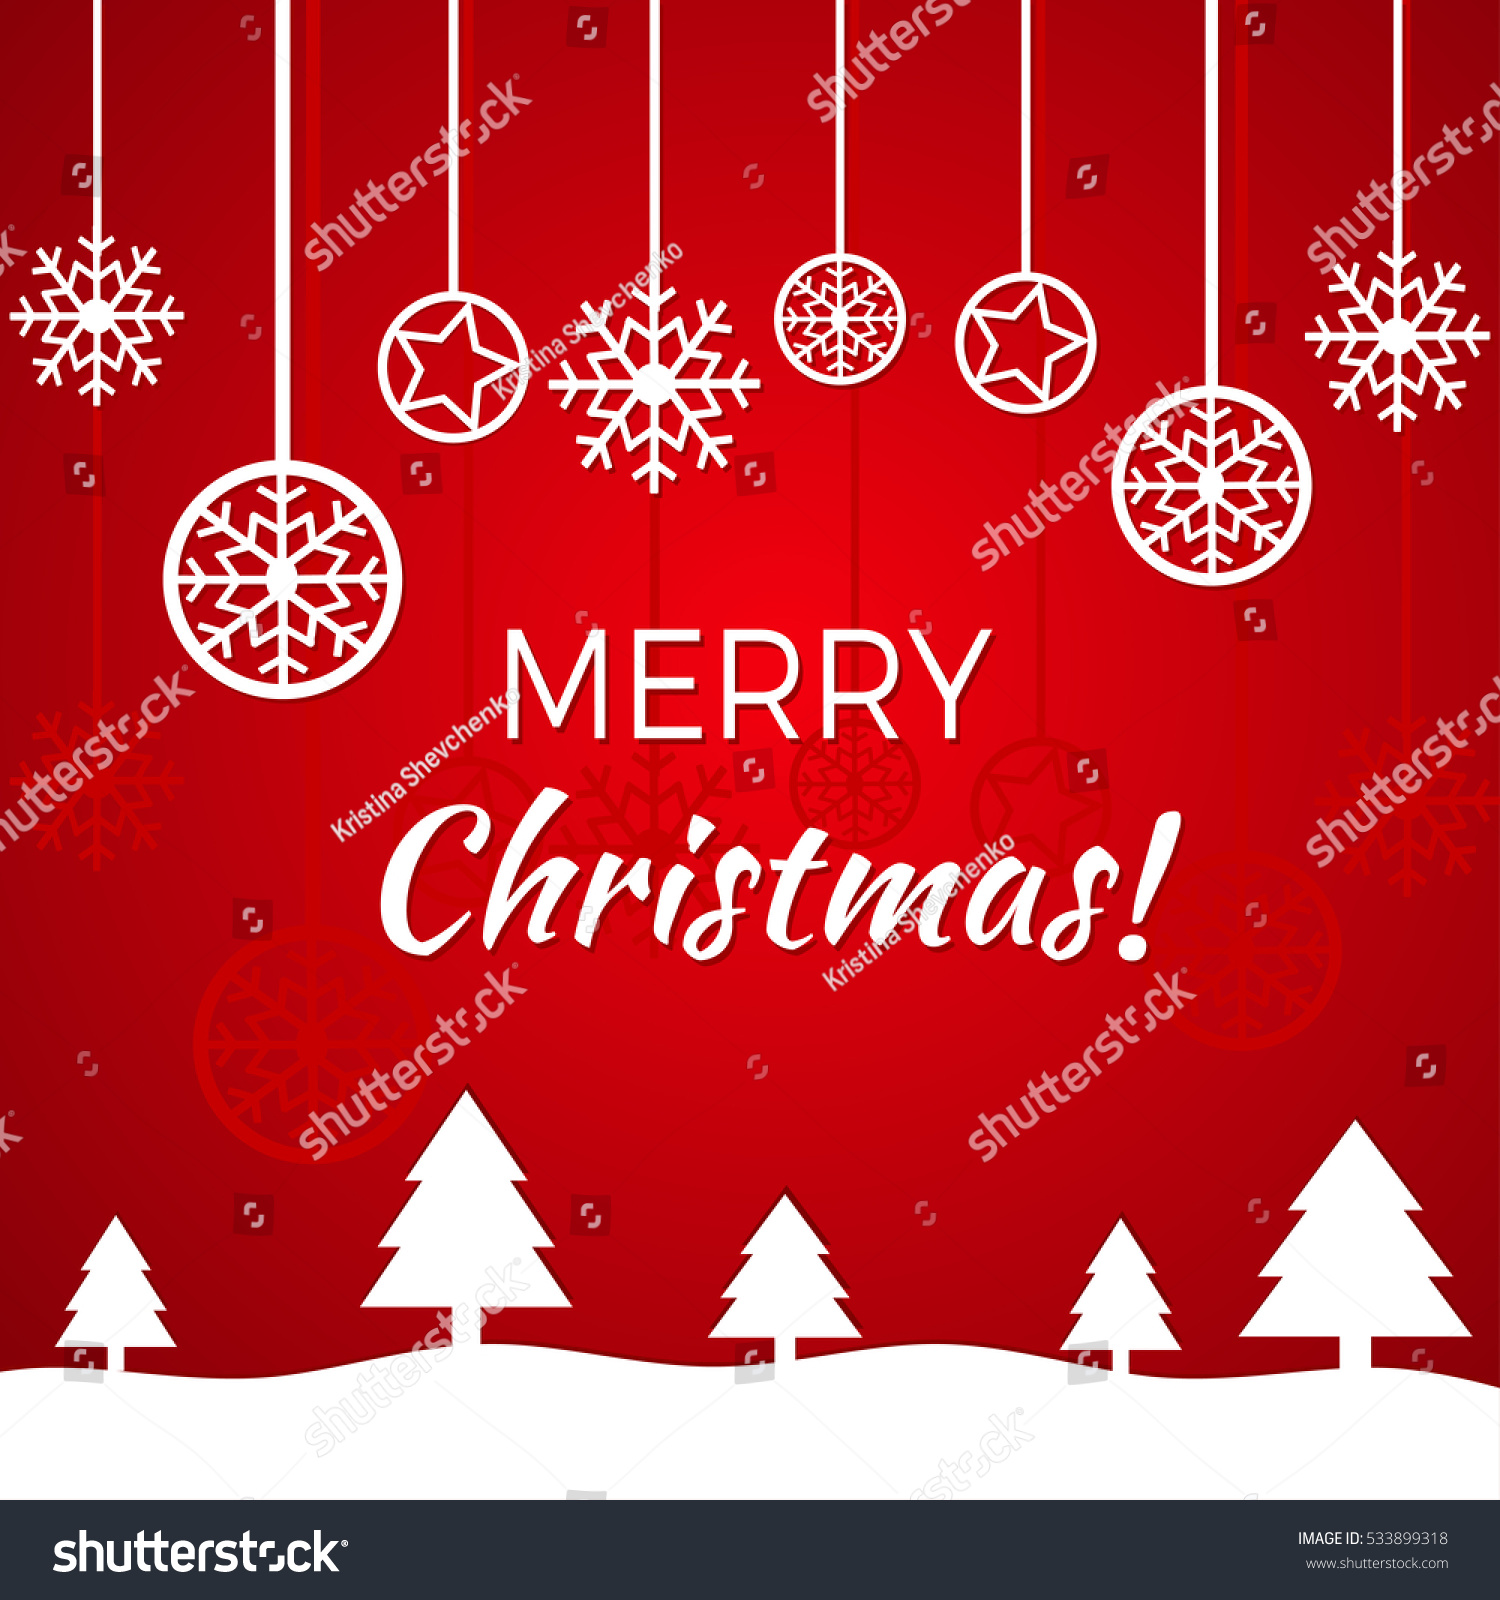 Christmas Greeting Card Design Vector Illustration Stock Photo